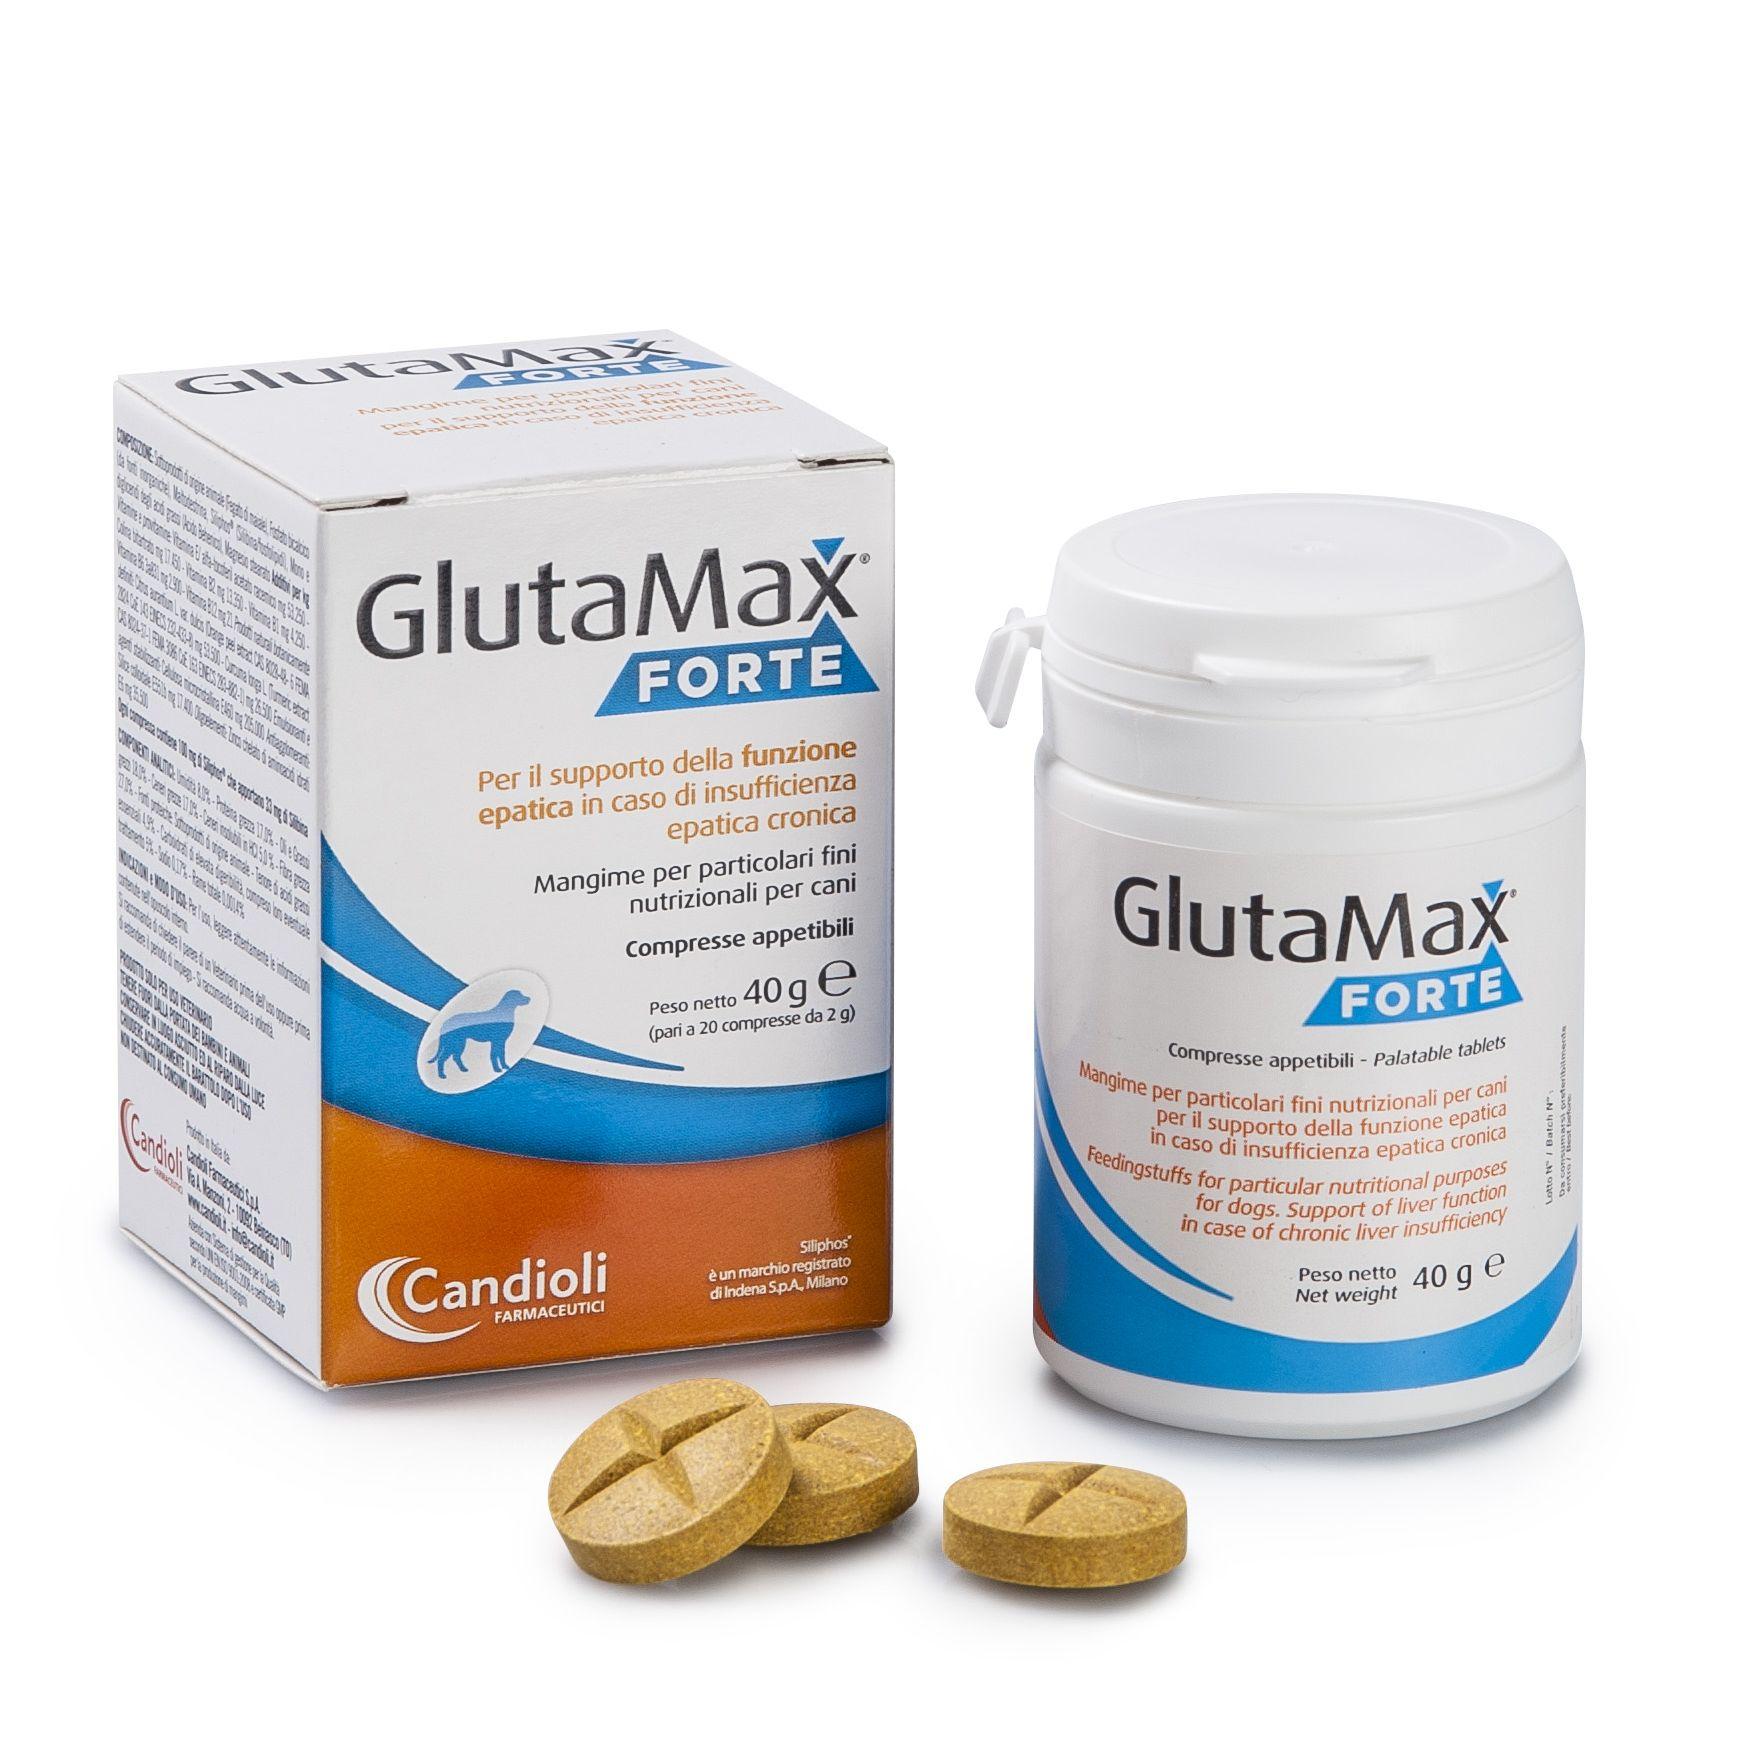 Candioli Glutamax Forte 20 Compresse